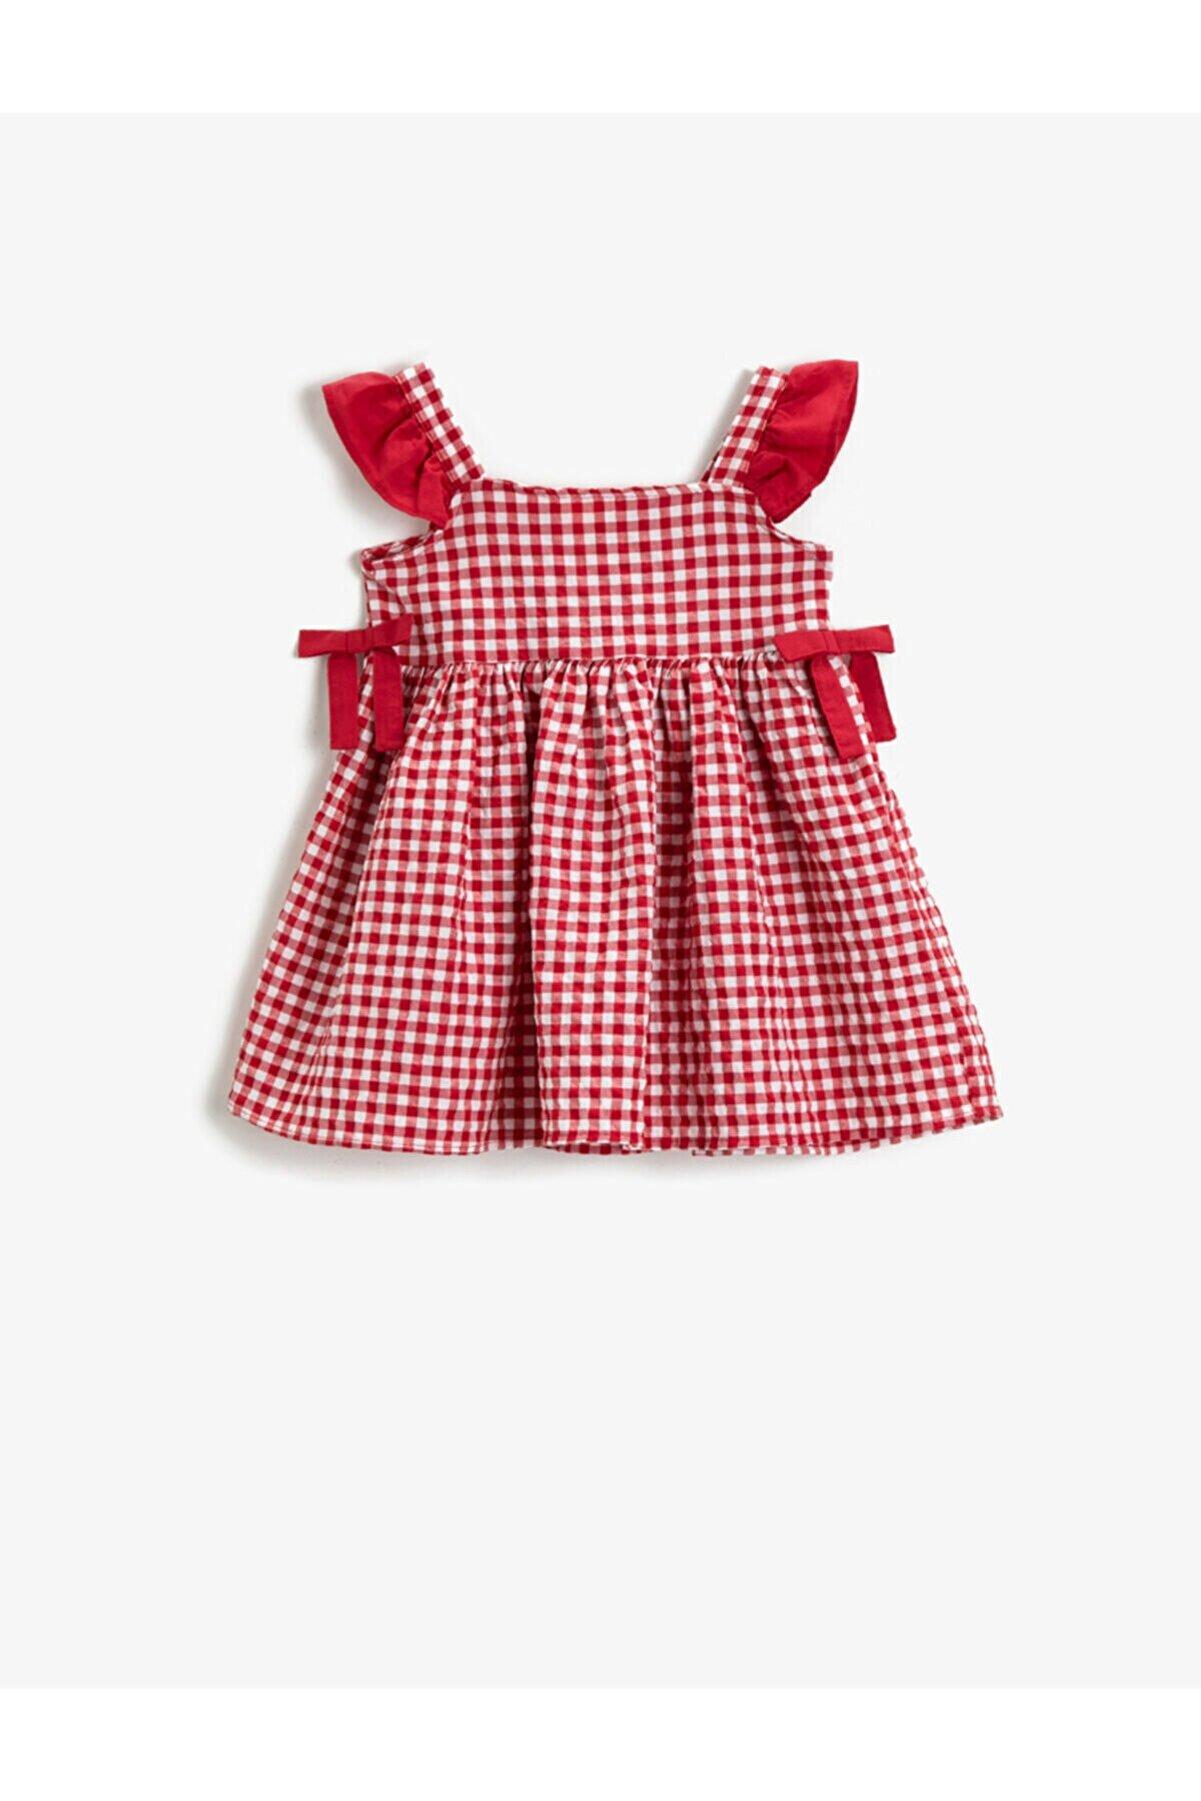 Koton Kız Çocuk Kırmızı Kareli Pamuklu Fiyonklu Elbise